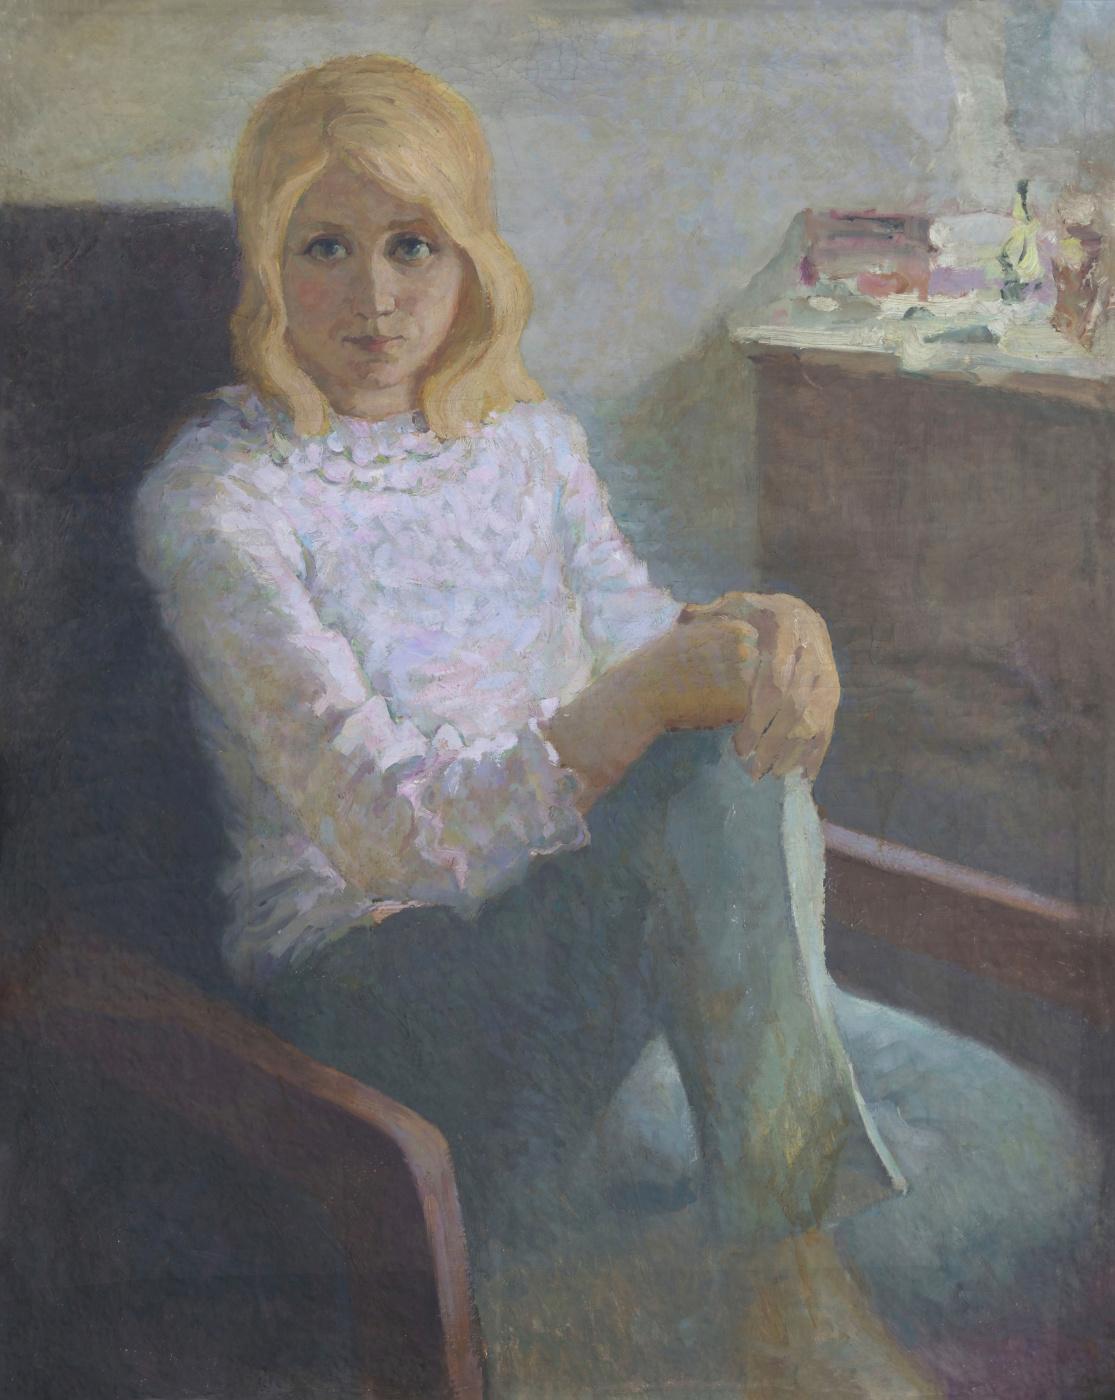 Alexandrovich Rudolf Pavlov. Portrait of a woman. Hope.